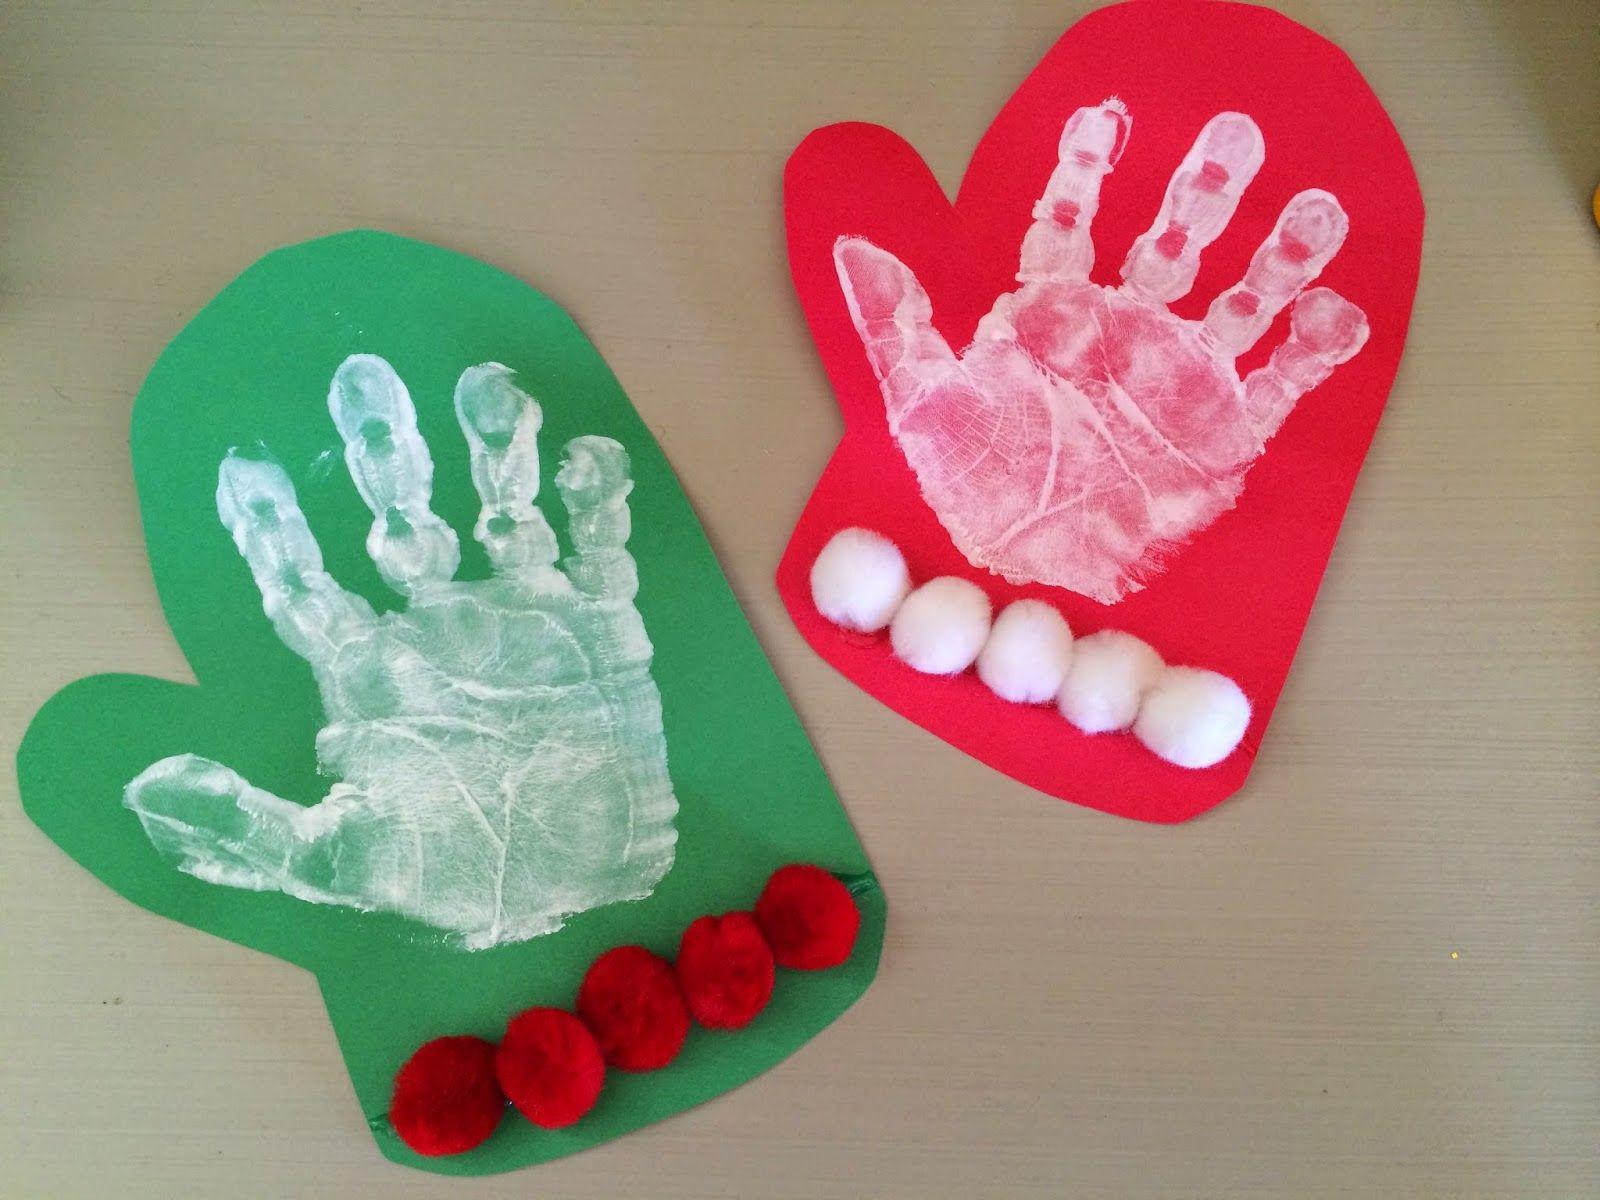 Holiday handprint footprint crafts footprint crafts for Winter holiday crafts for kids